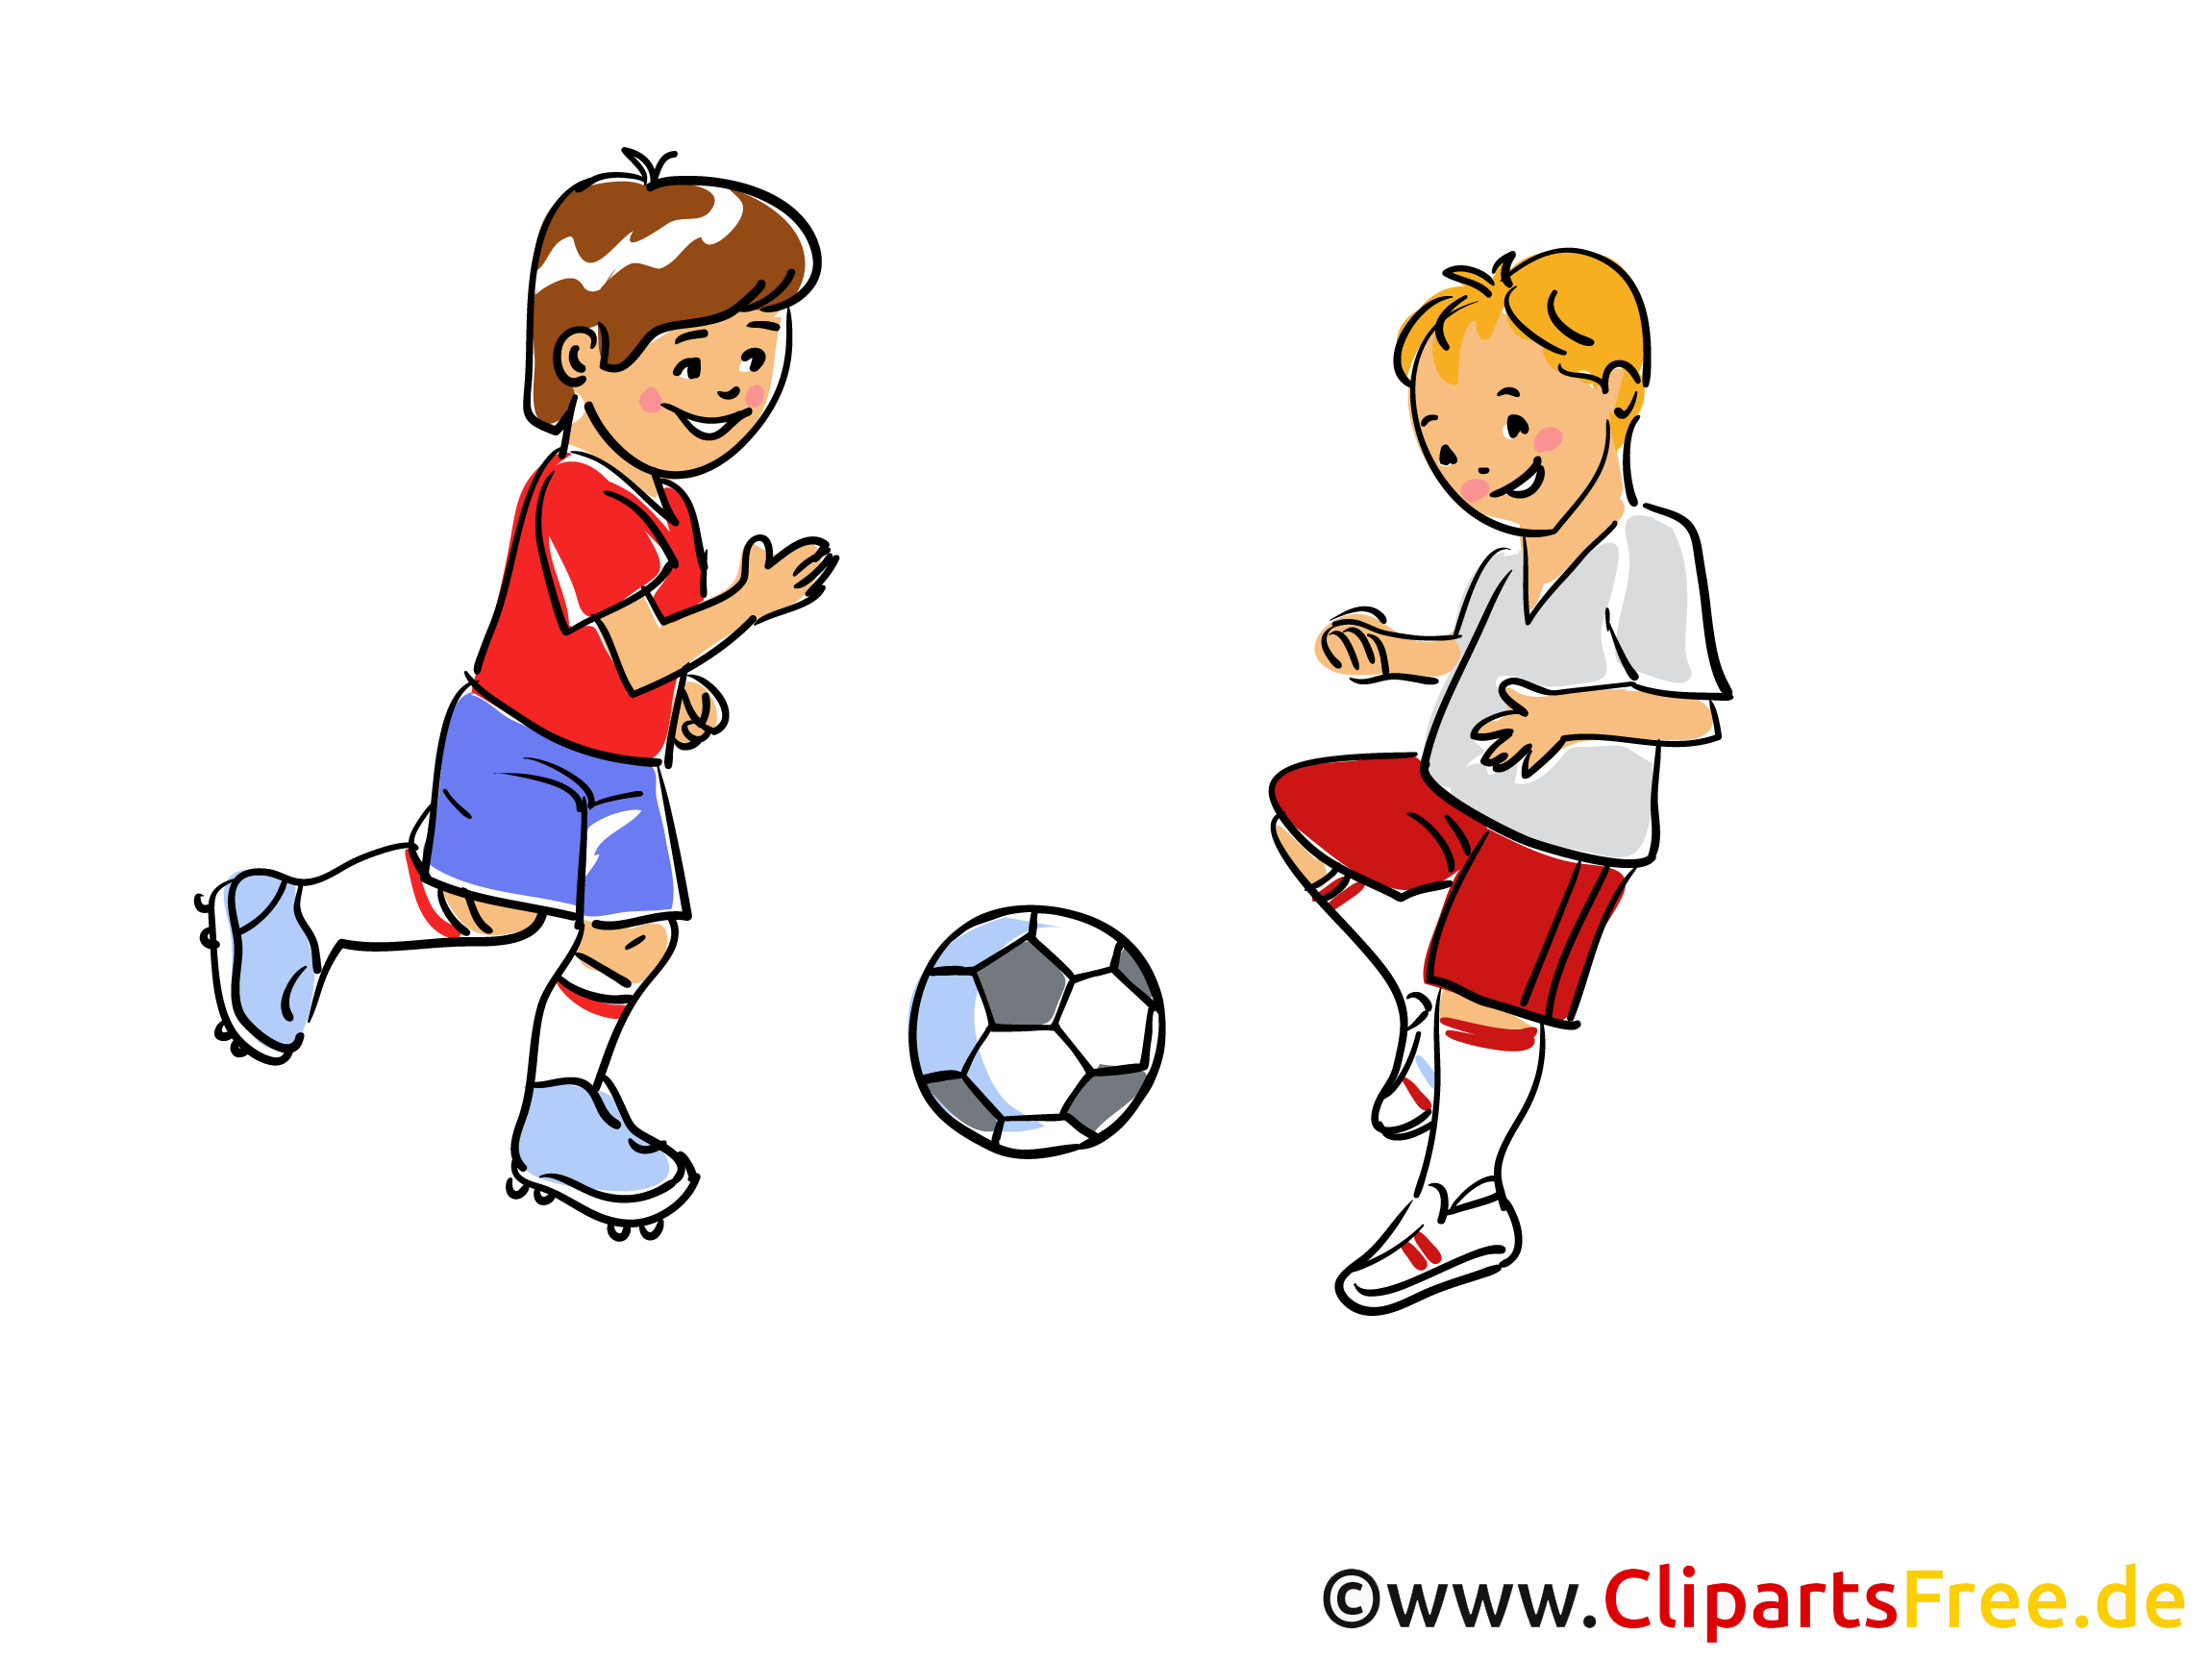 fussball spiele spiele